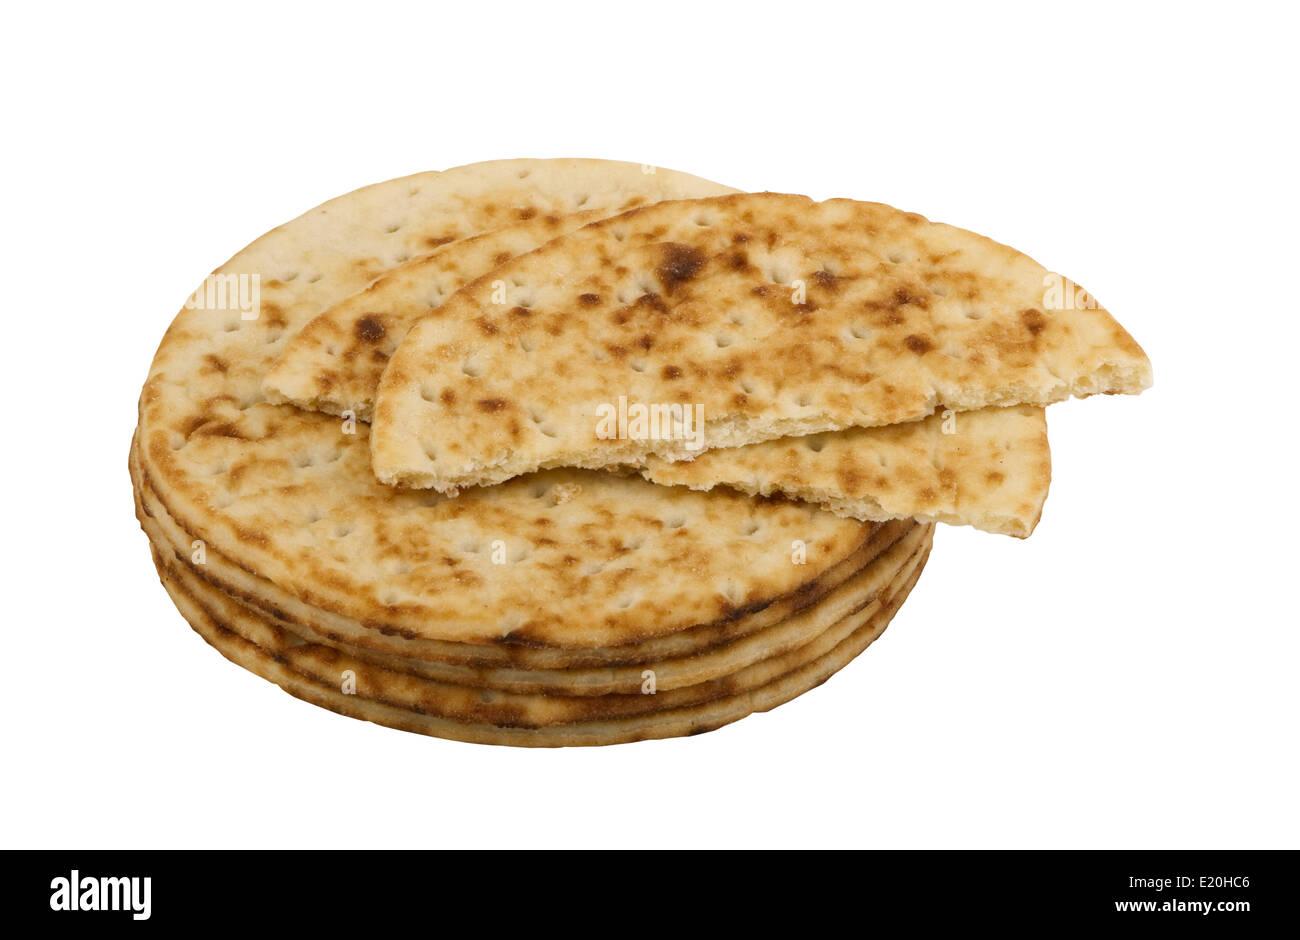 dietary wheat tortillas - Stock Image